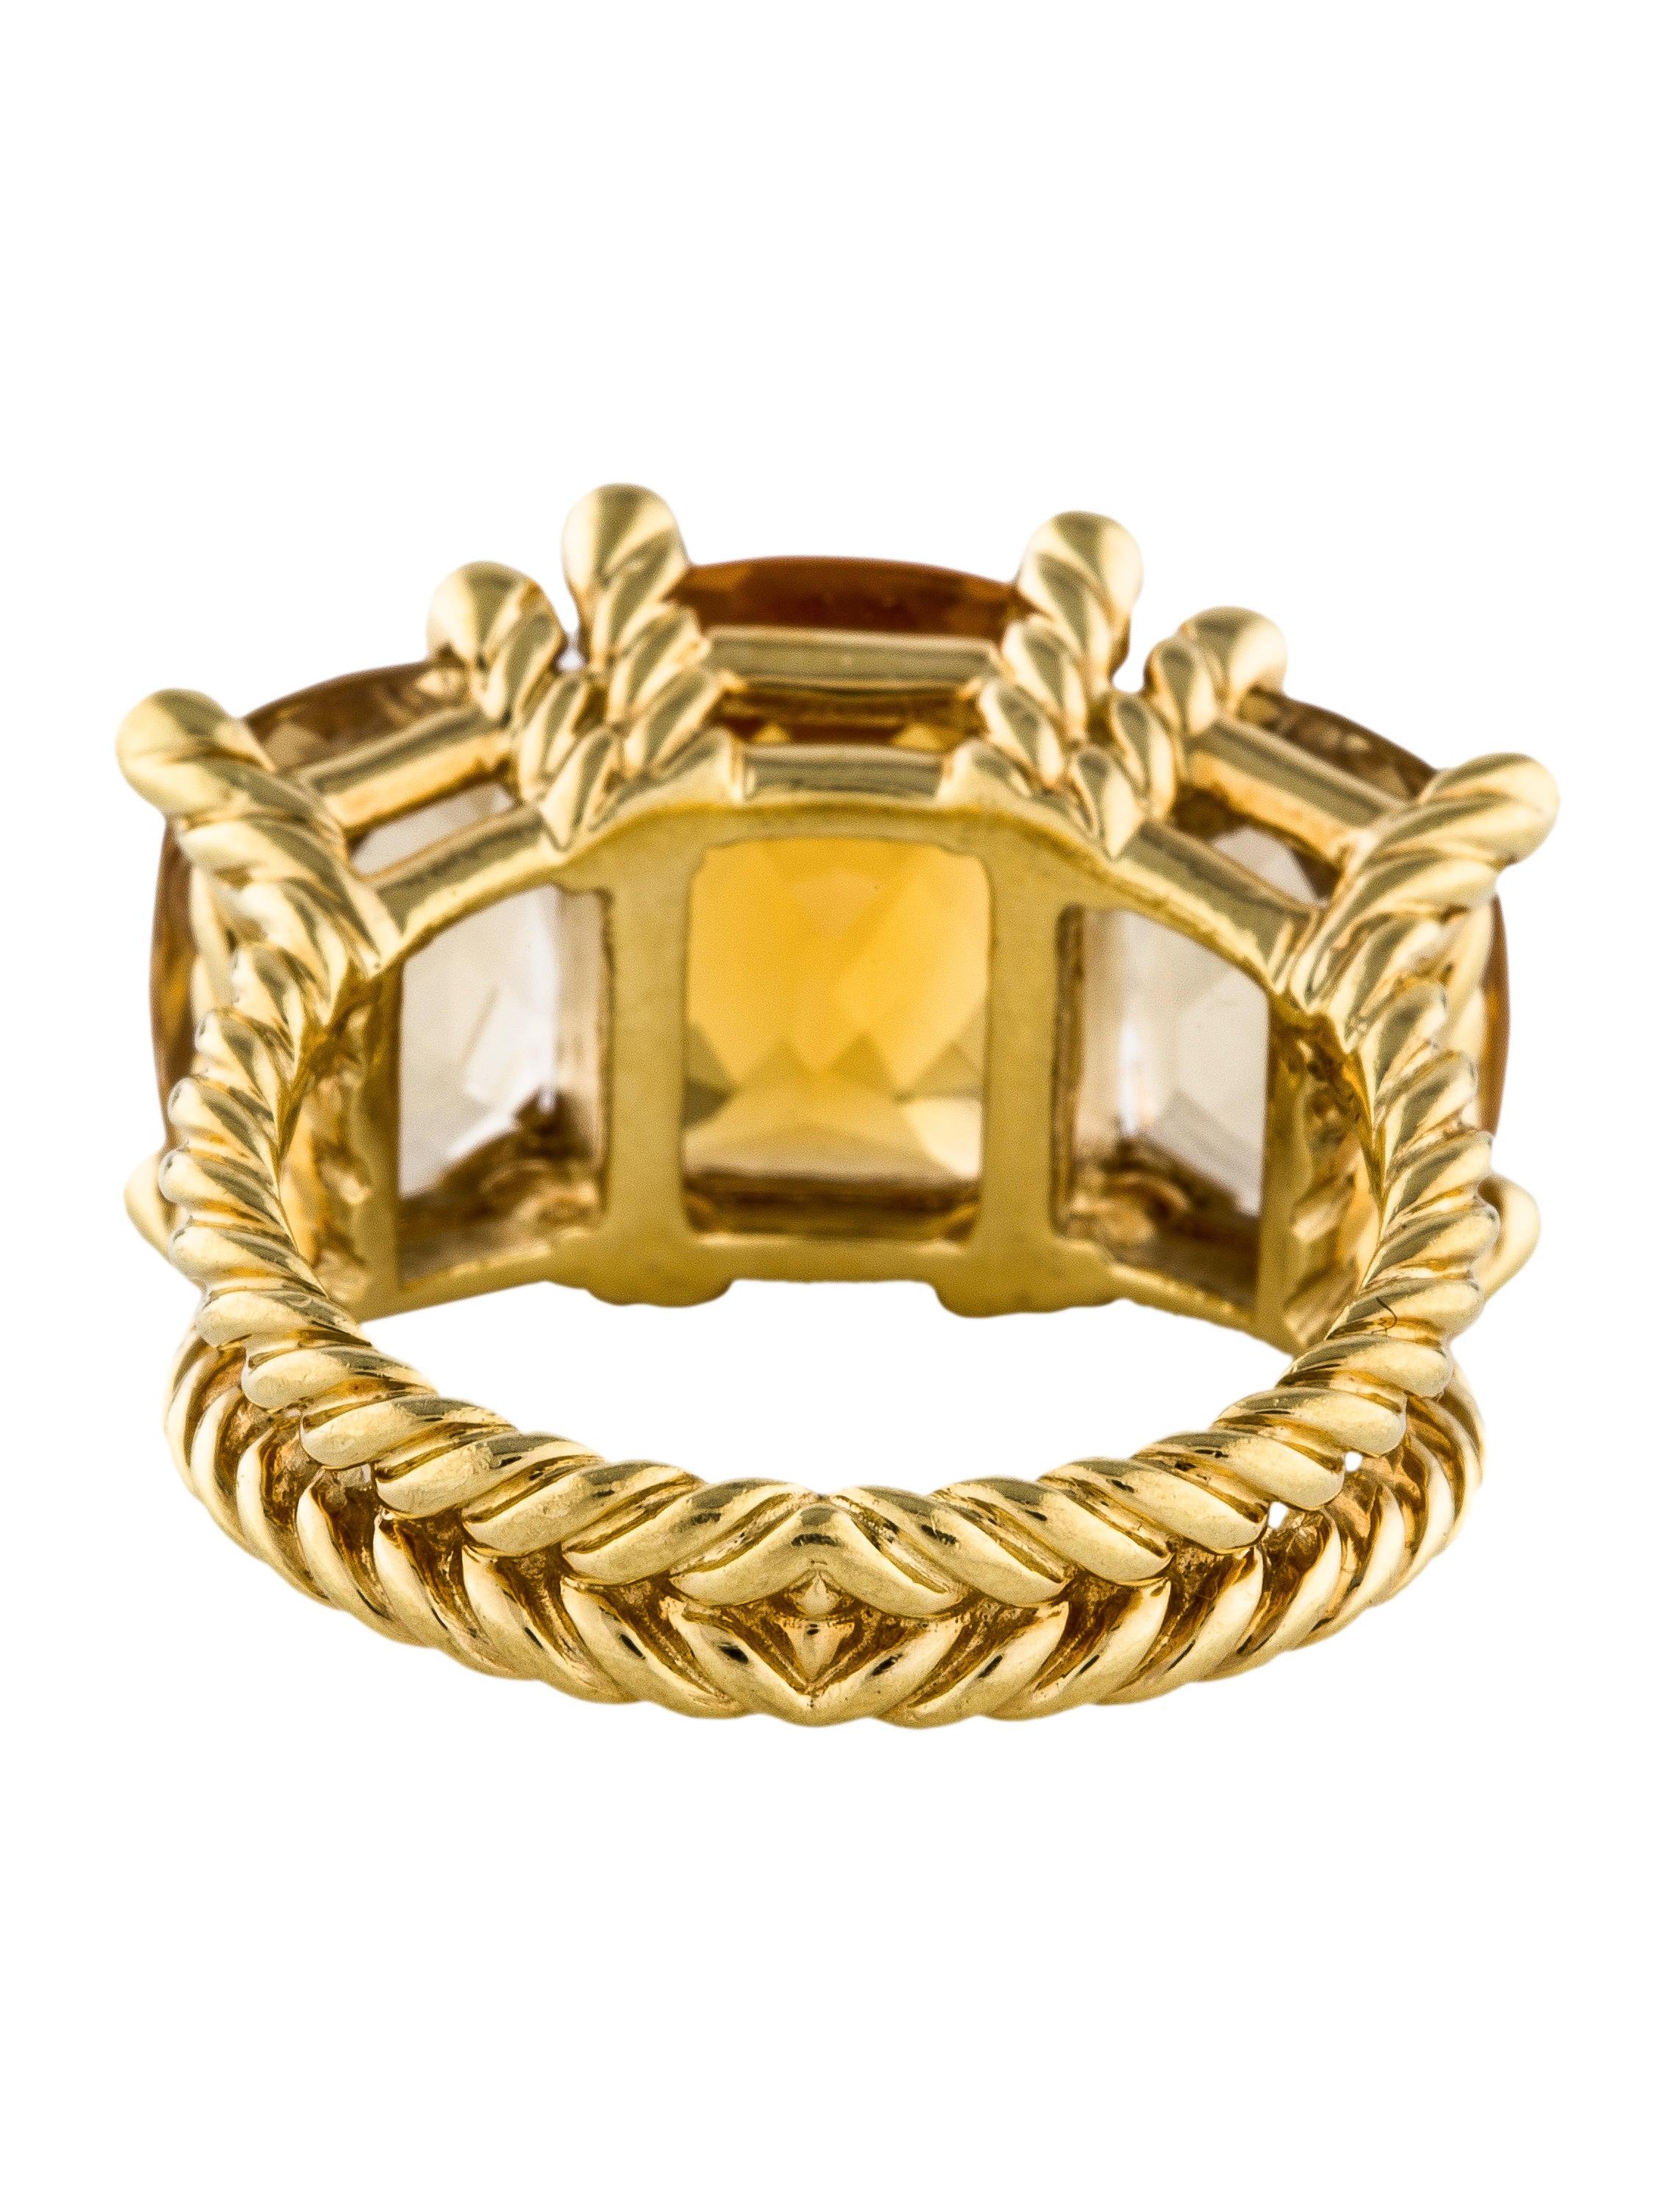 David yurman citrine wheaton three stone ring rings for David yurman inspired jewelry rings